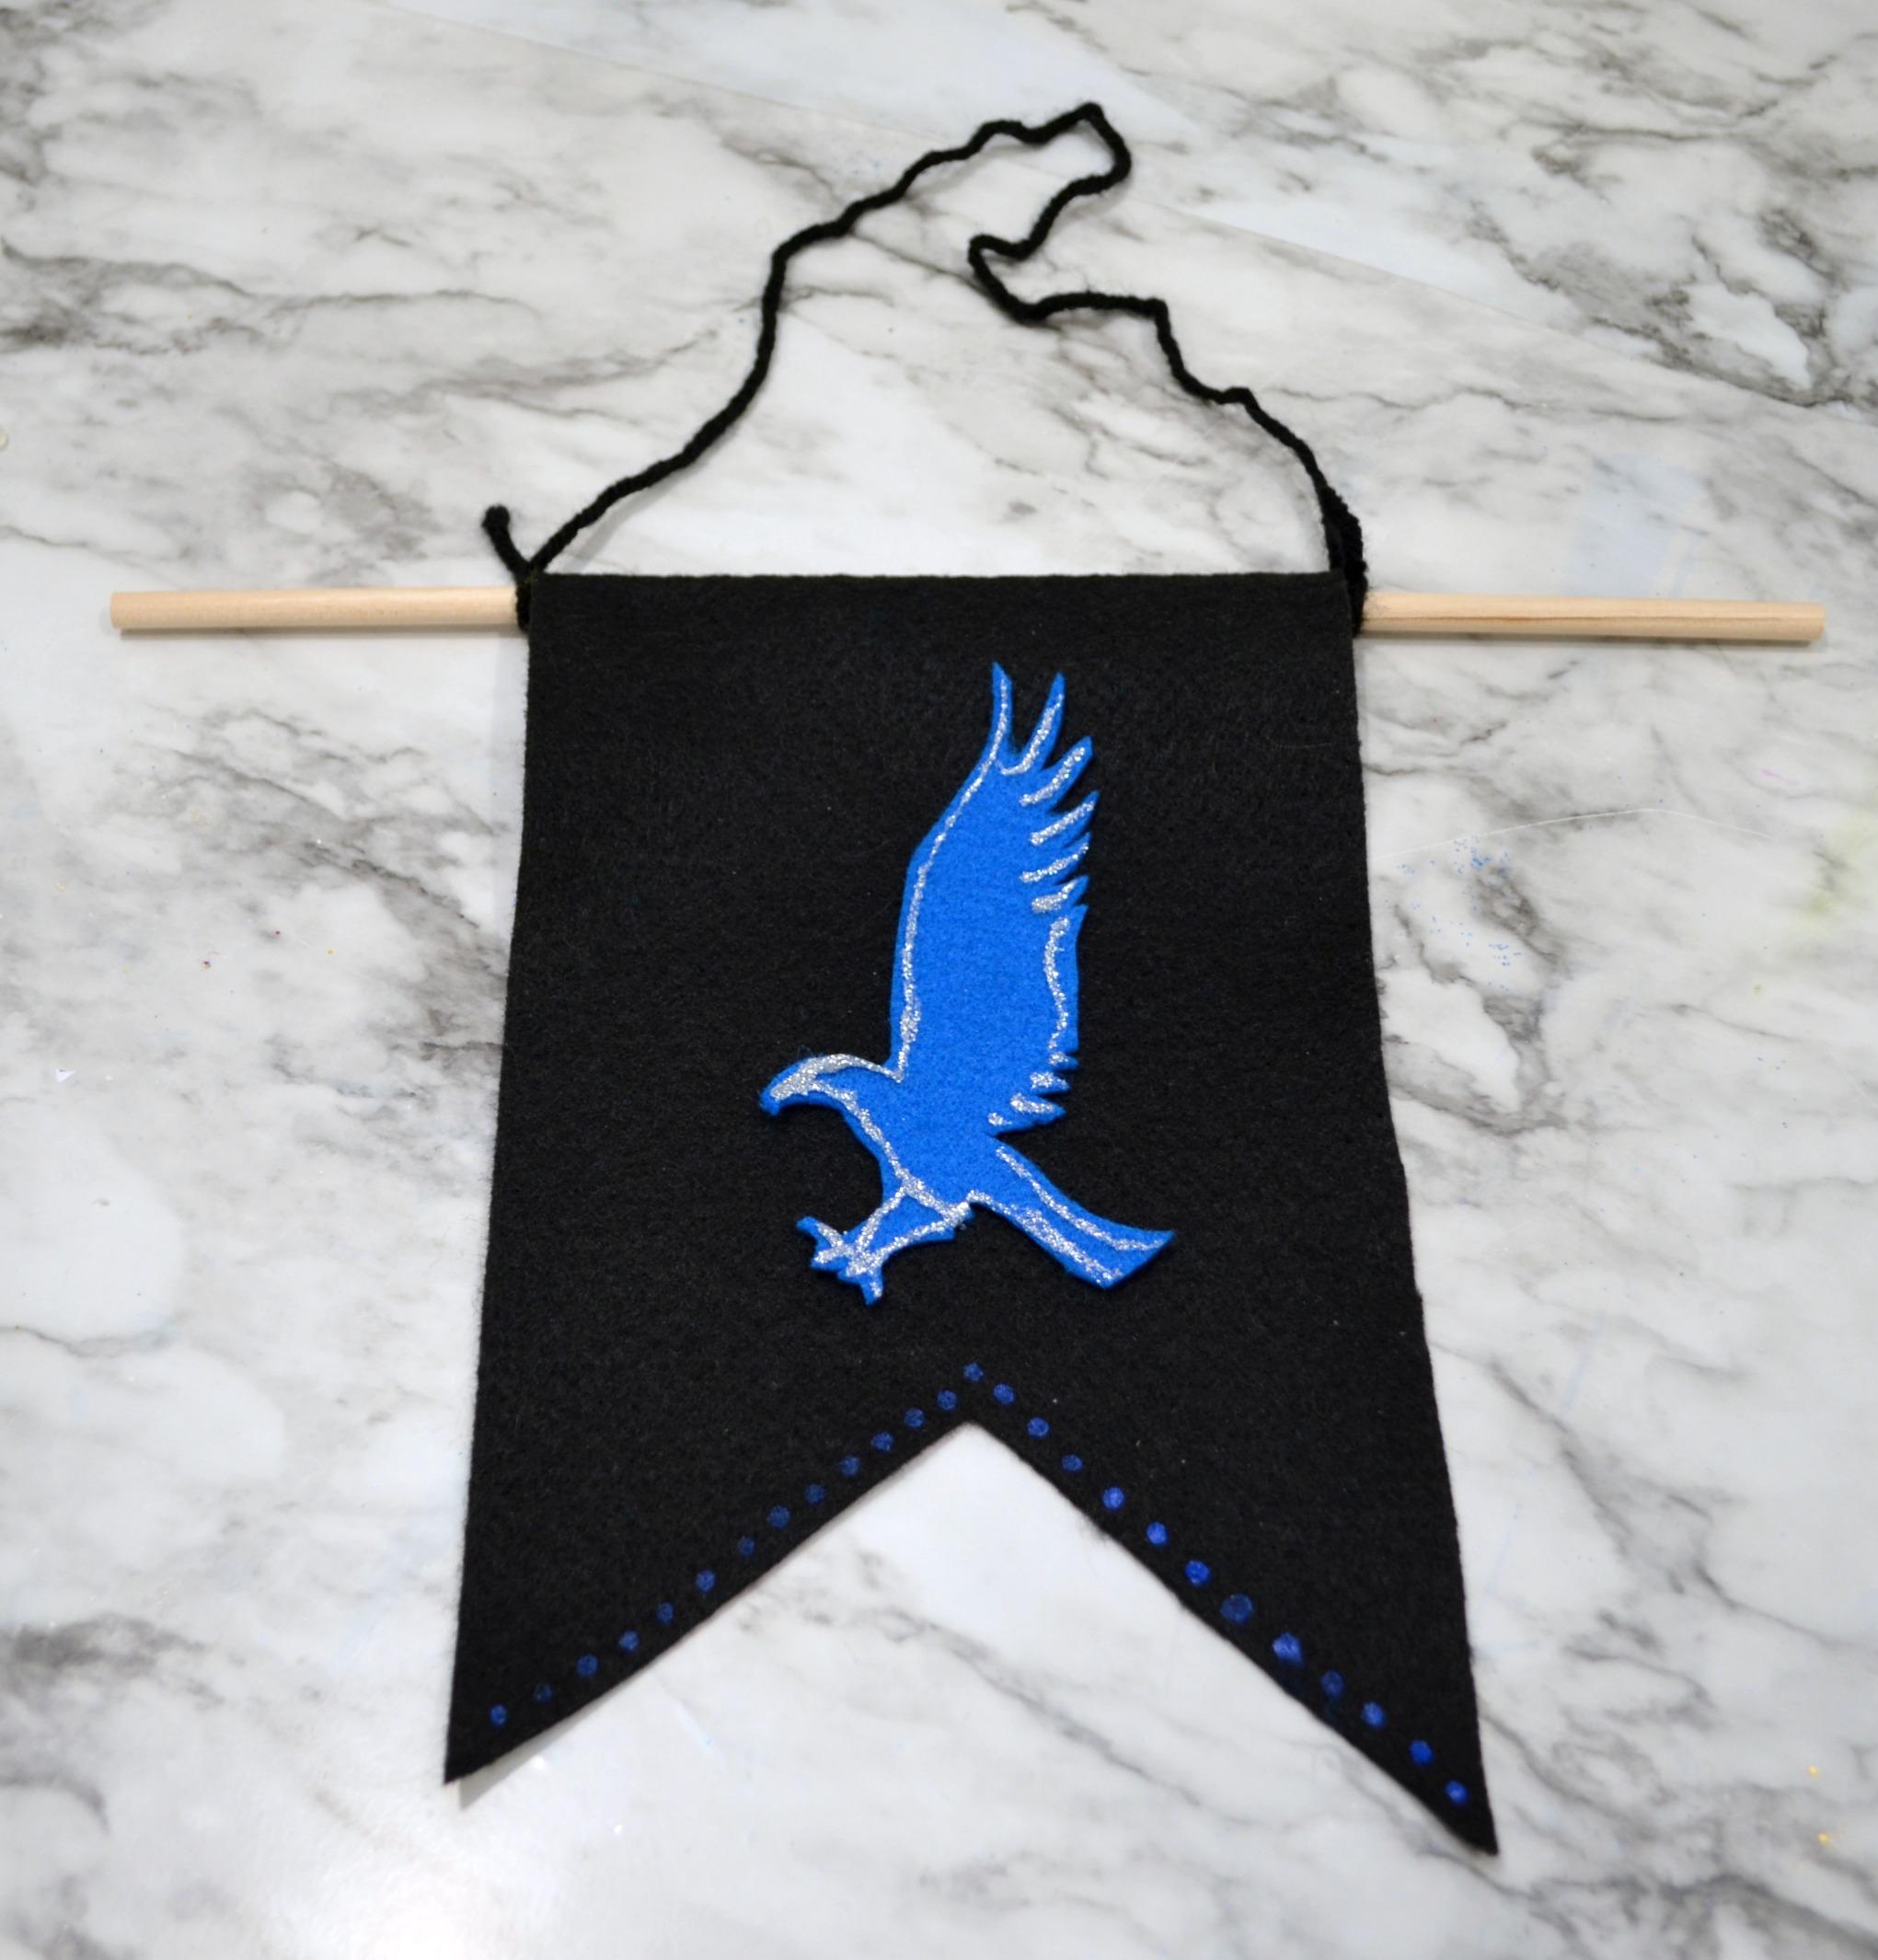 Hogwarts House Banners